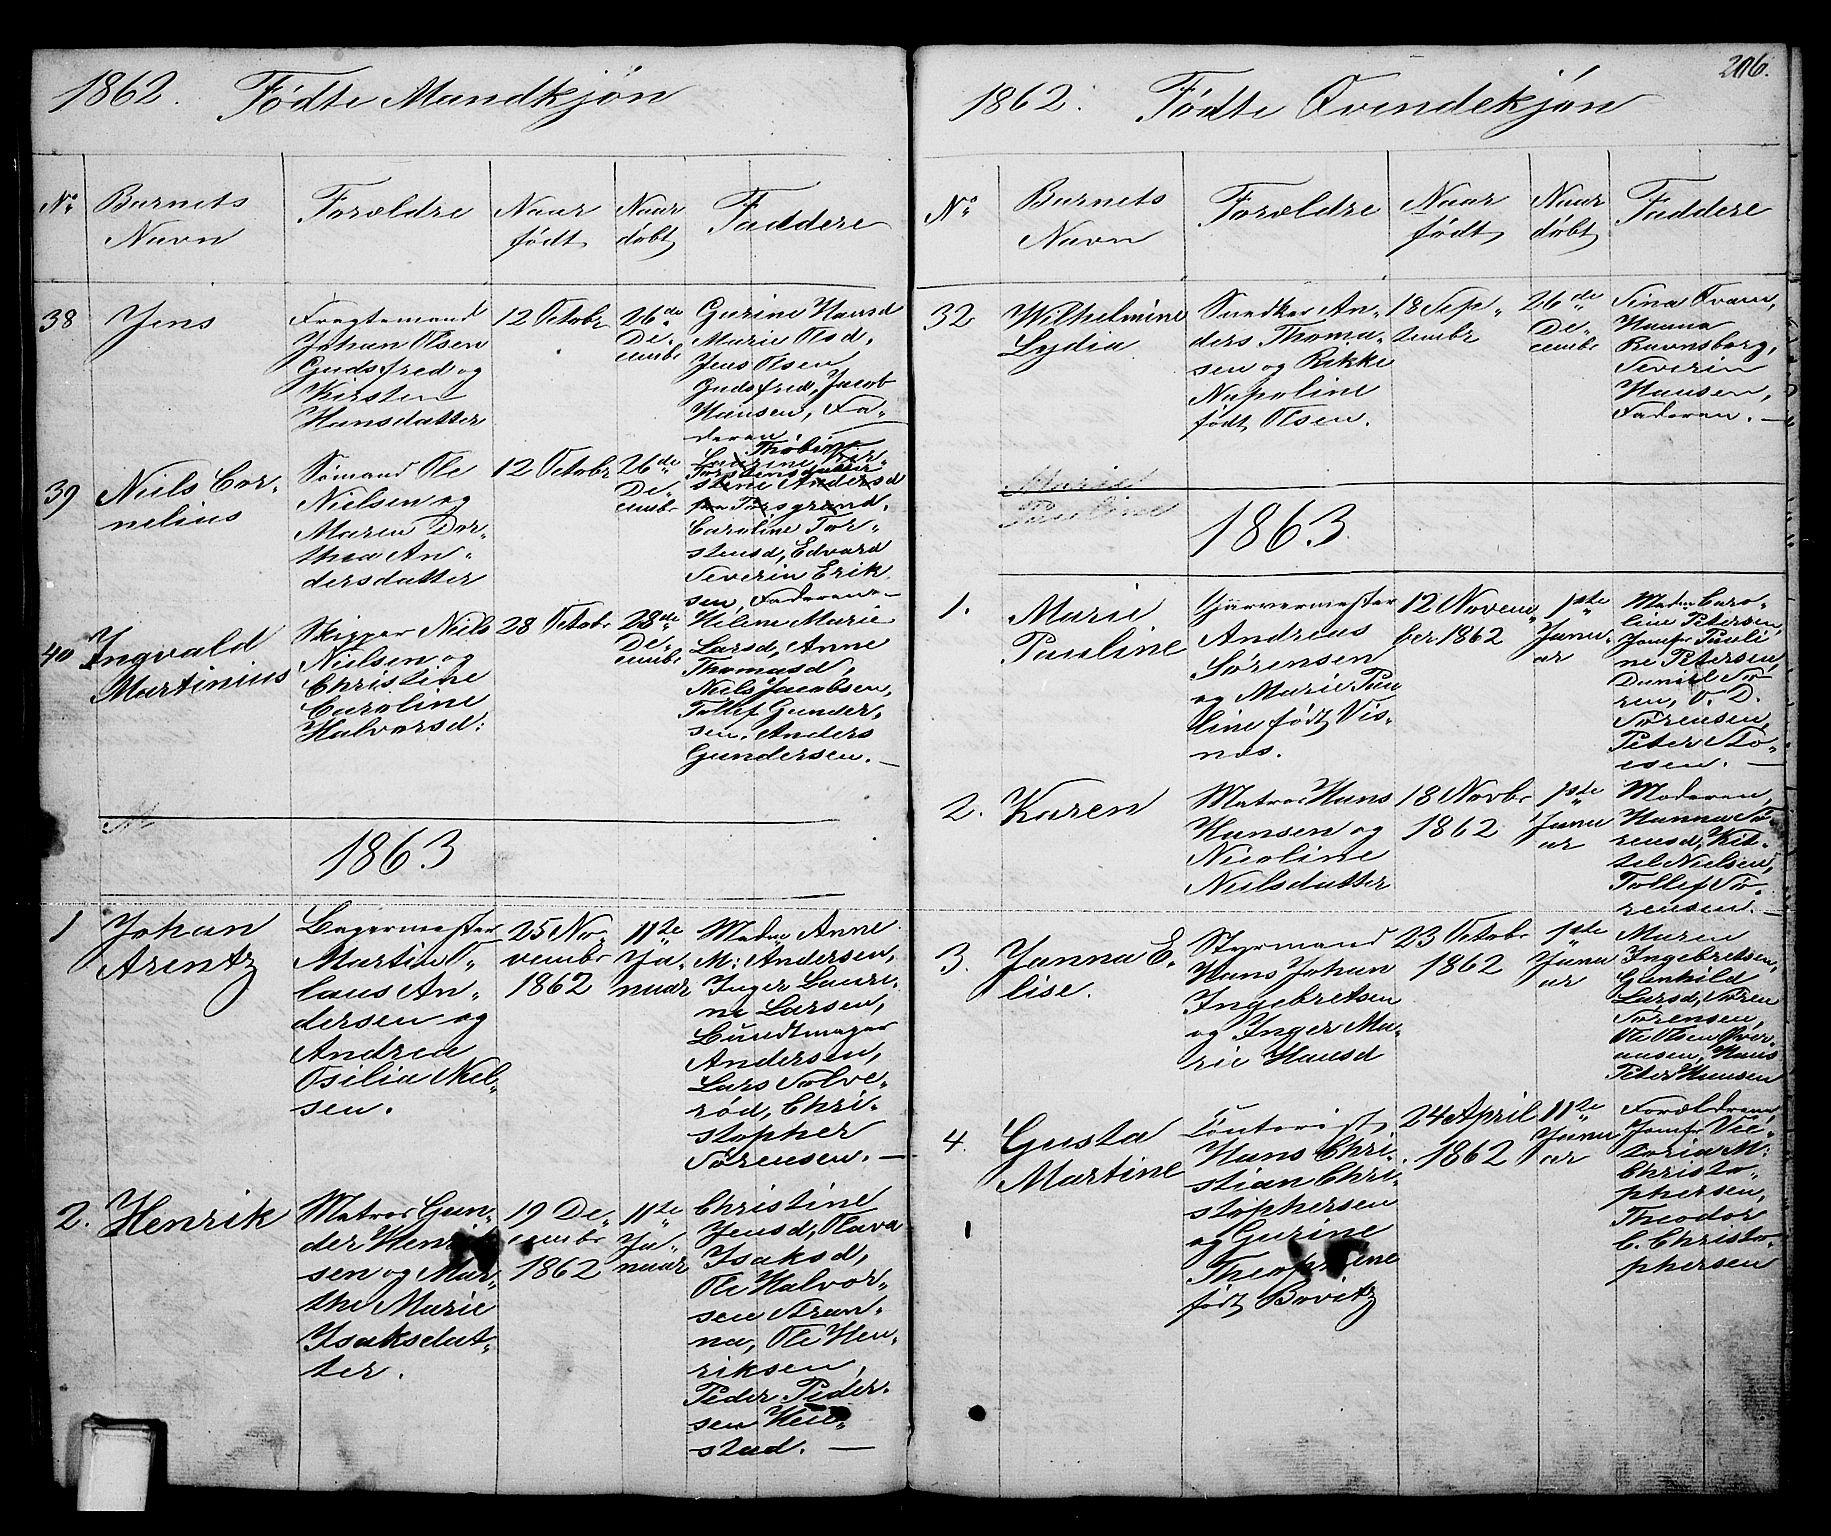 SAKO, Brevik kirkebøker, G/Ga/L0002: Klokkerbok nr. 2, 1846-1865, s. 206